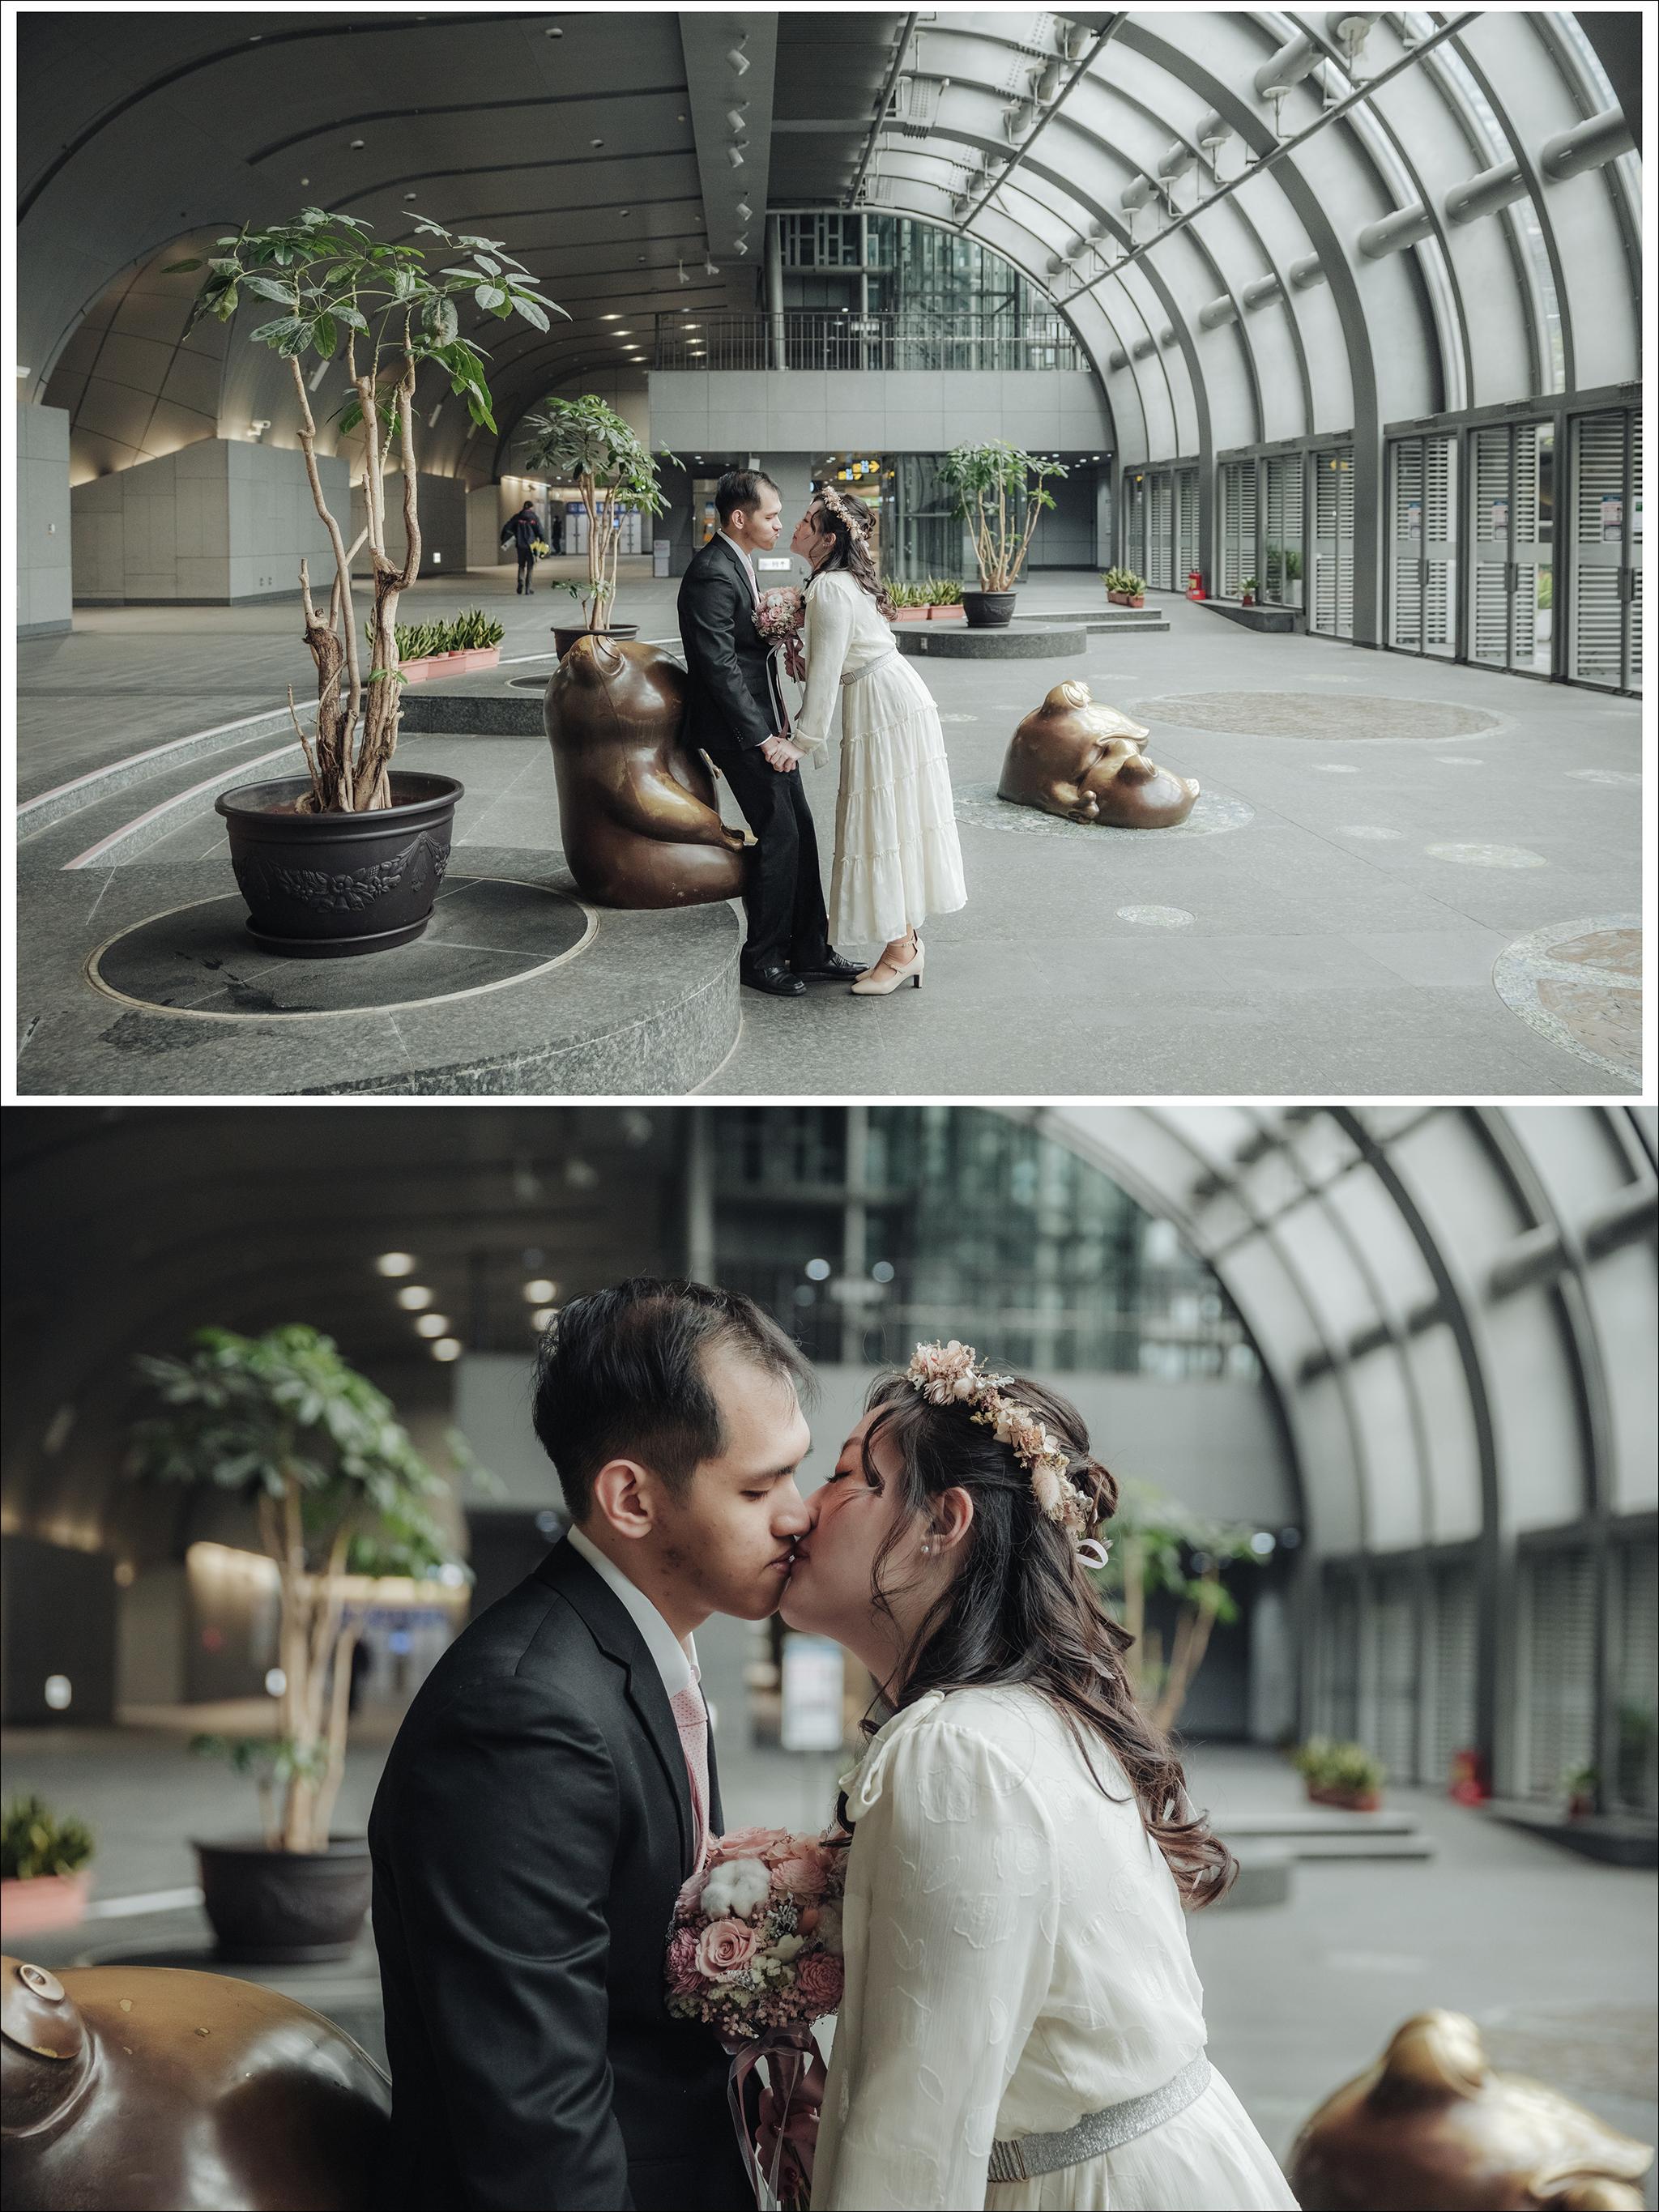 51498200307 c3b39cfccc o - 【證婚寫真】+馥瑤&威宇+